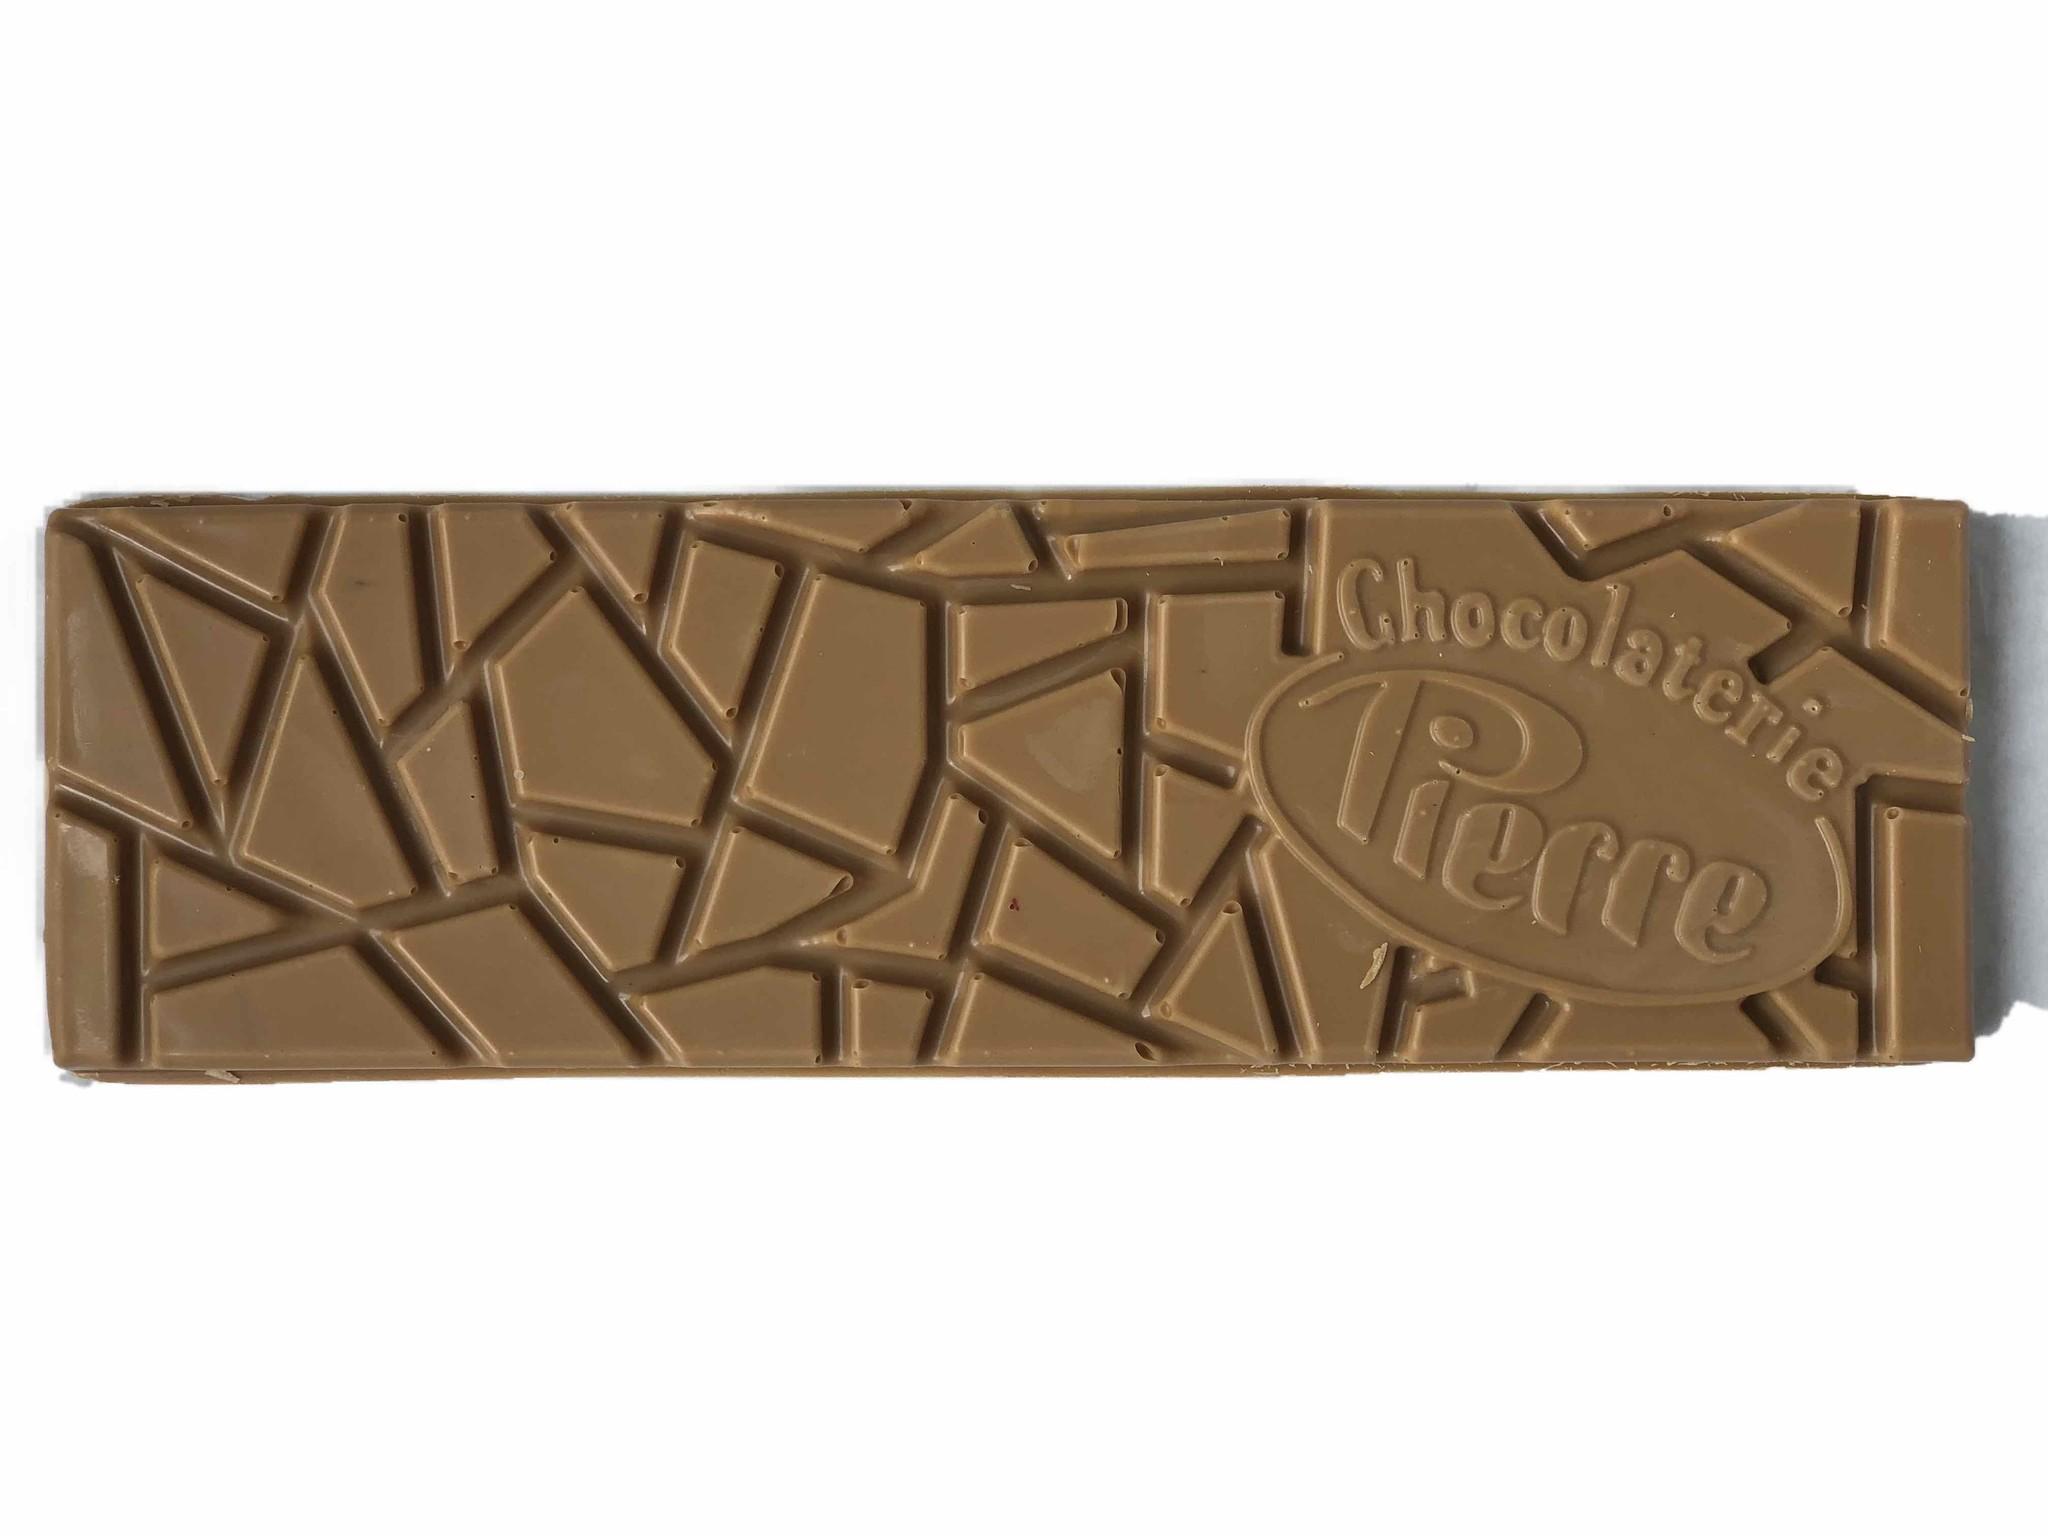 Reep van gold chocolade